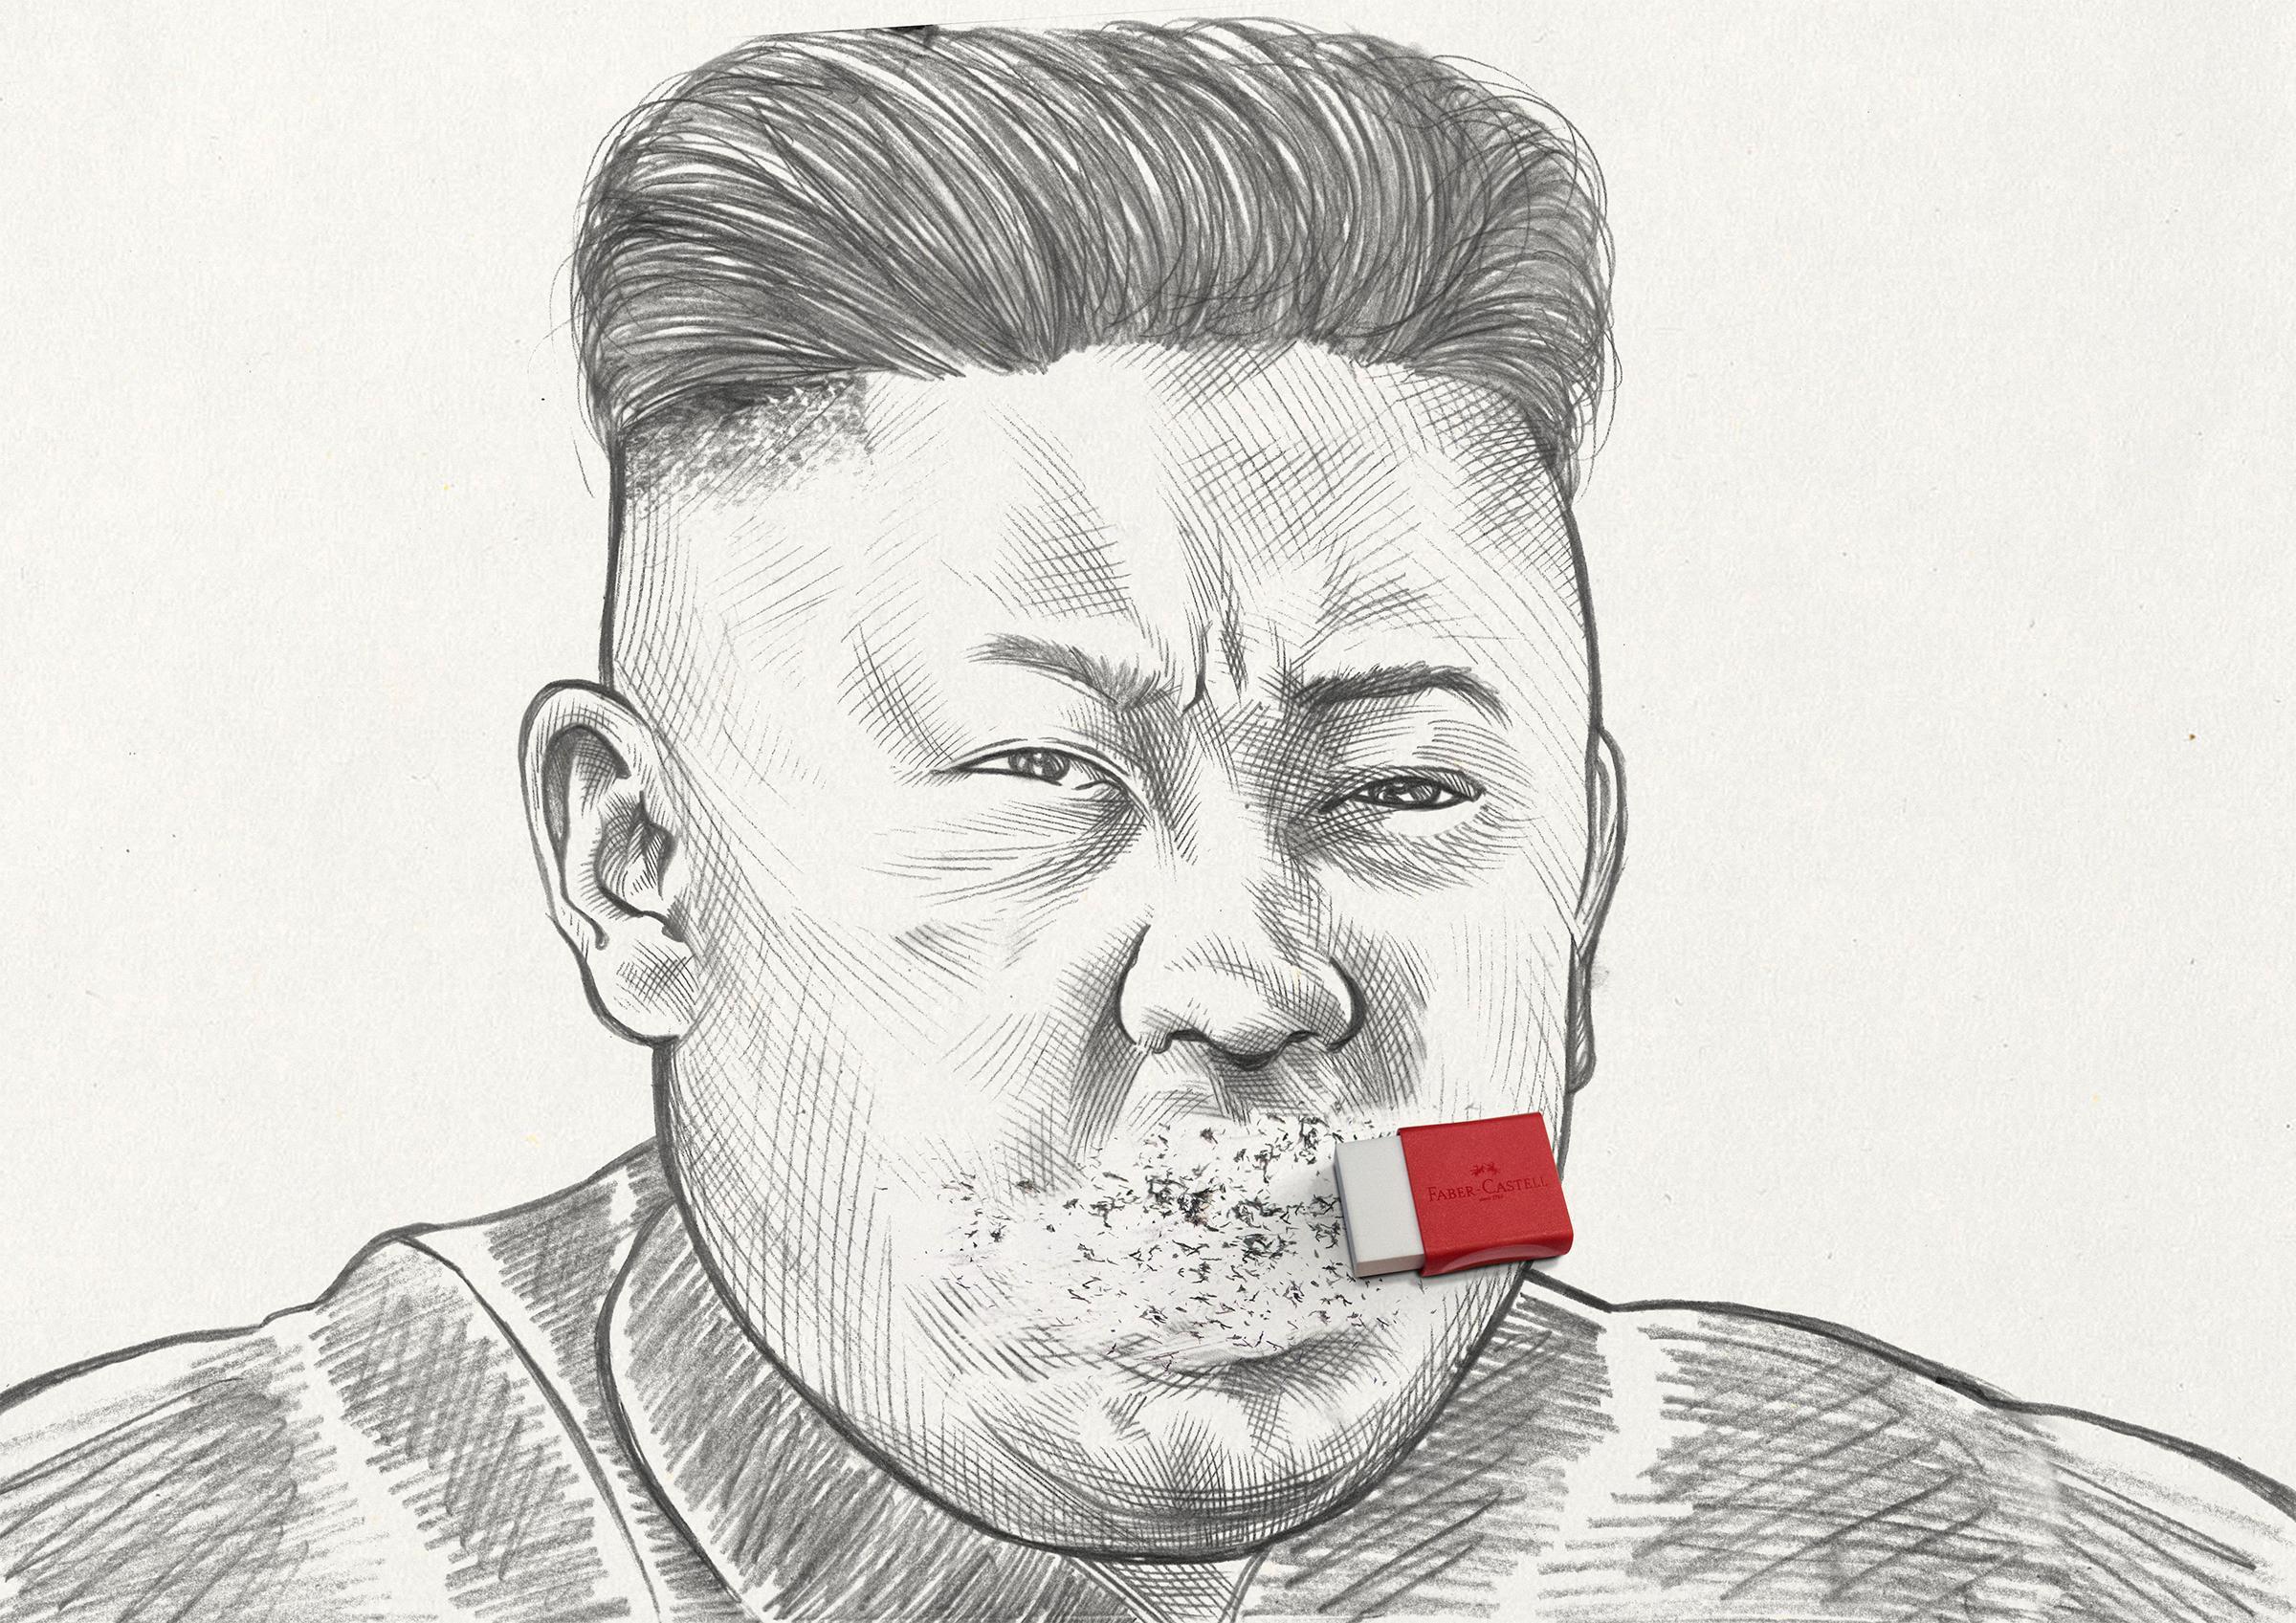 Faber Castell Print Ad - Erasing Mistakes - Kim